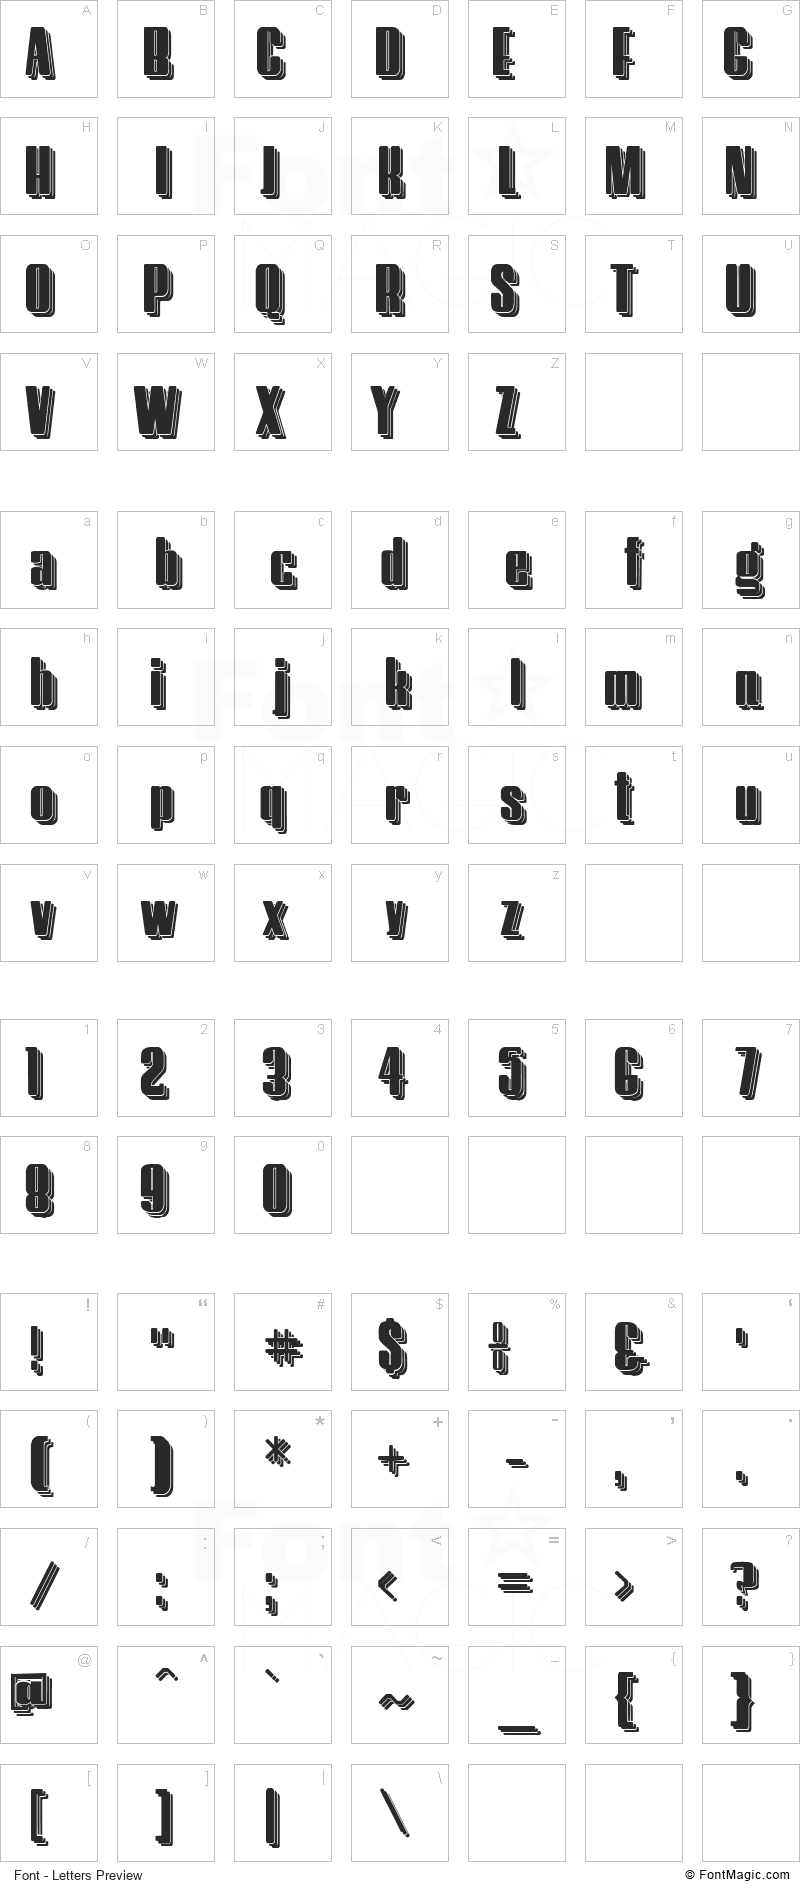 Hostil Font - All Latters Preview Chart